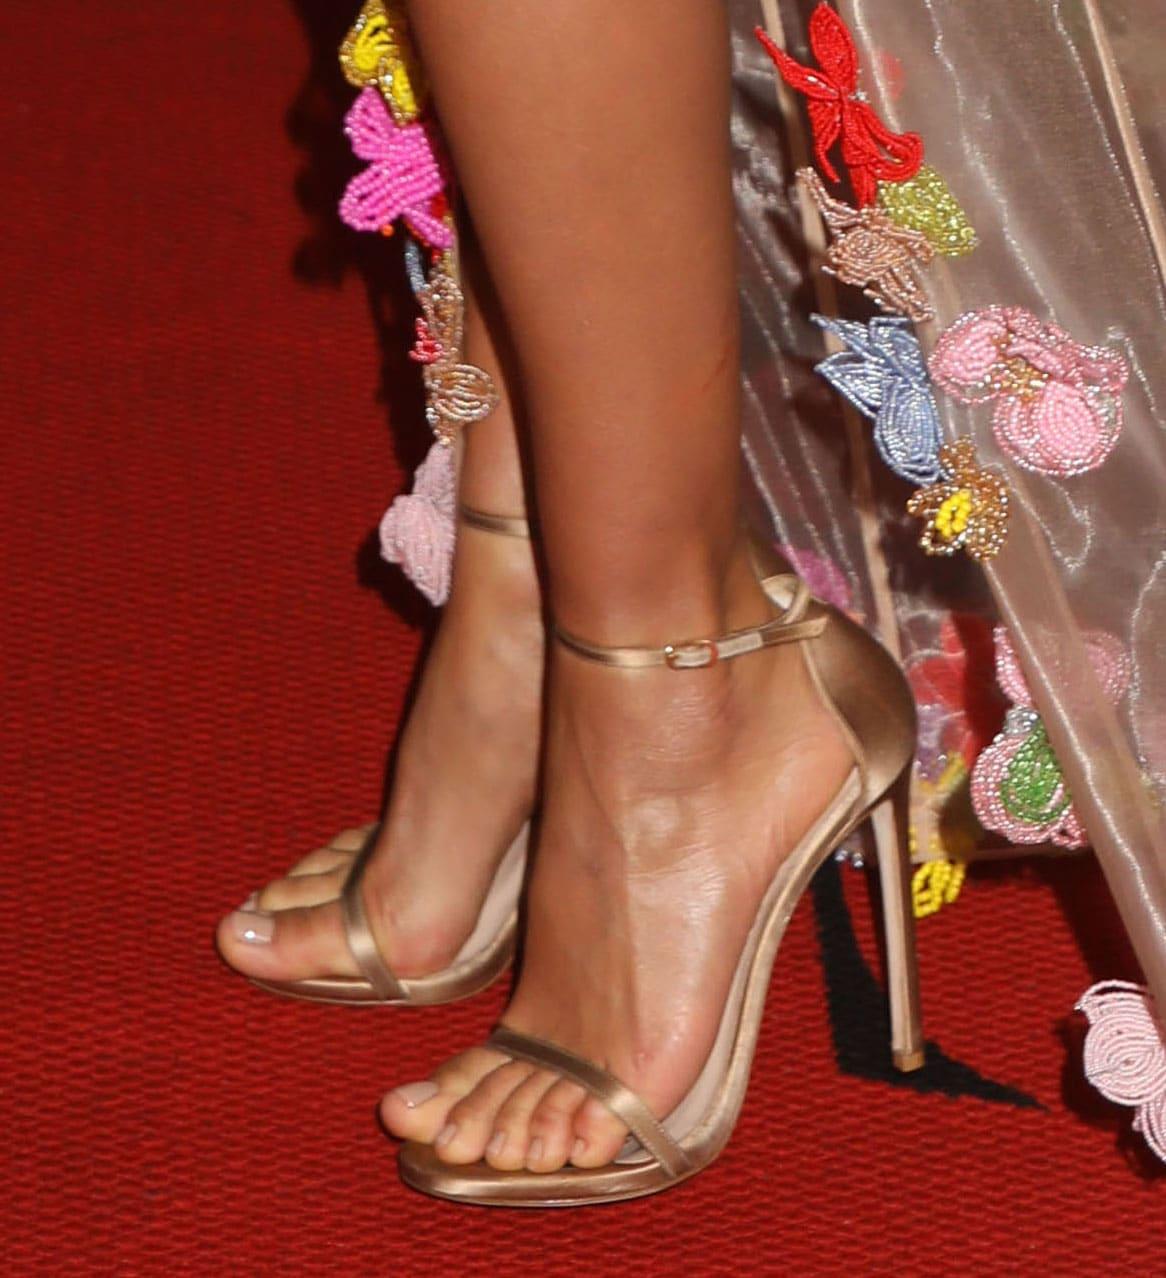 Irina Shayk displays her feet in classic Stuart Weitzman Nudist heels